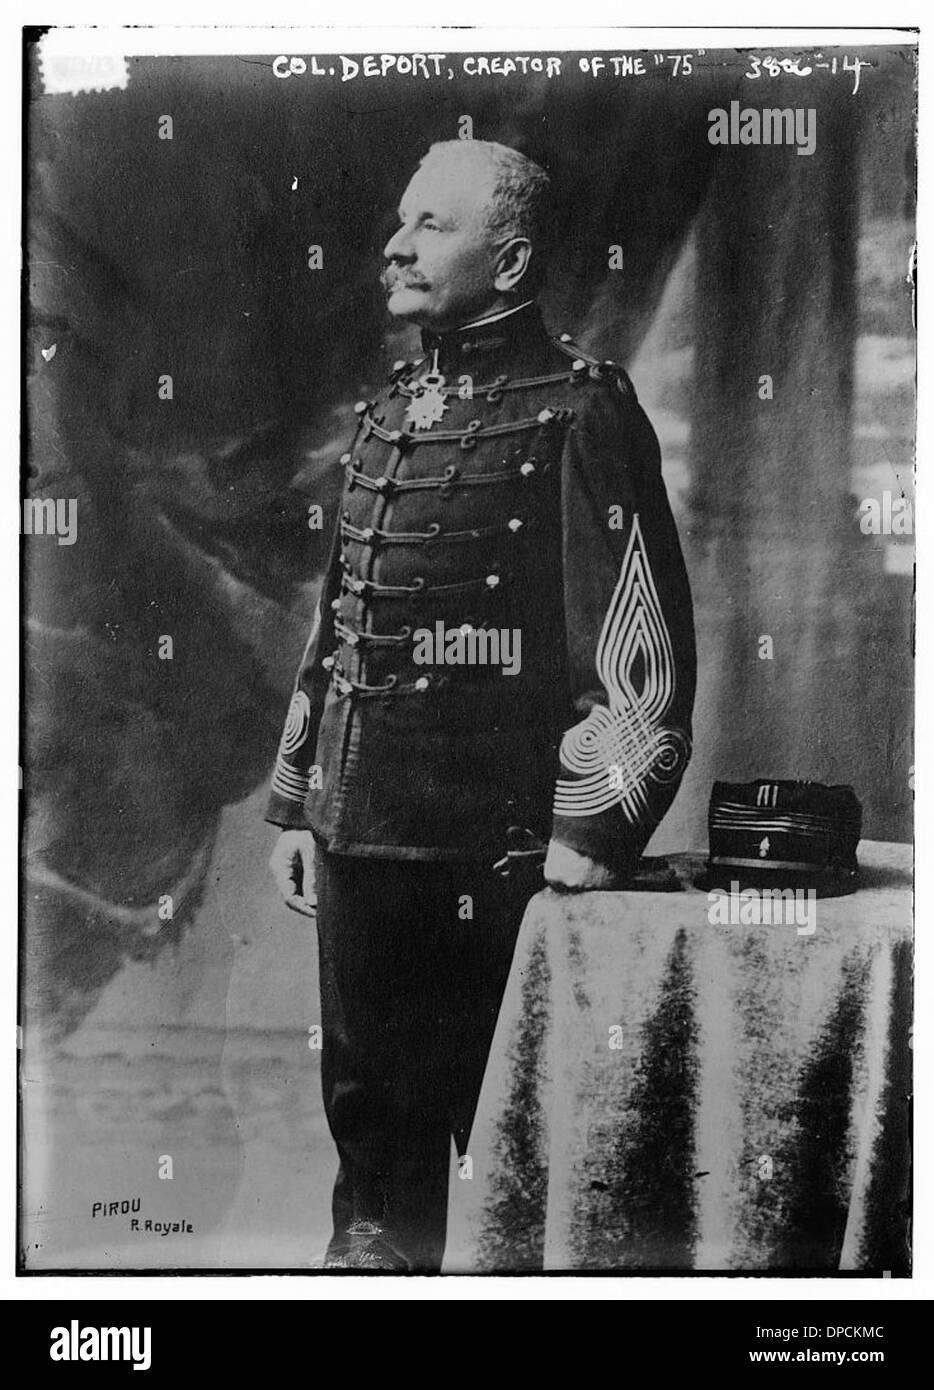 Col. Deport, Creator of the '75' (LOC) - Stock Image